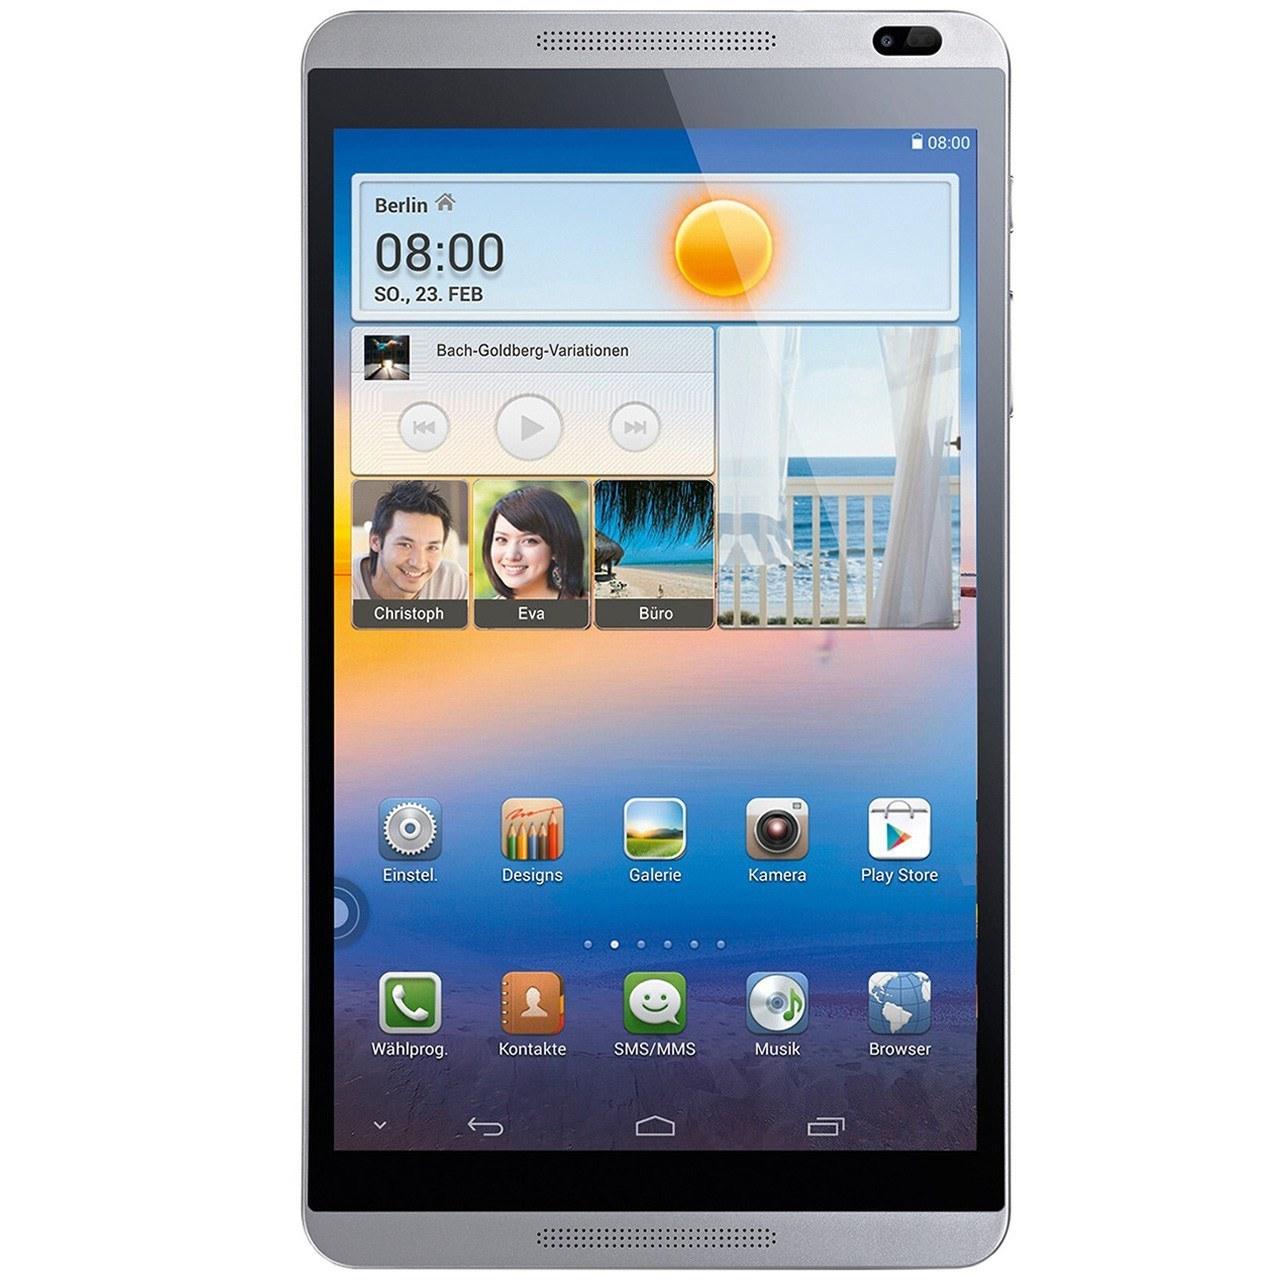 تبلت هوآوي مدل MediaPad M1 8.0 3G - ظرفيت 8 گيگابايت